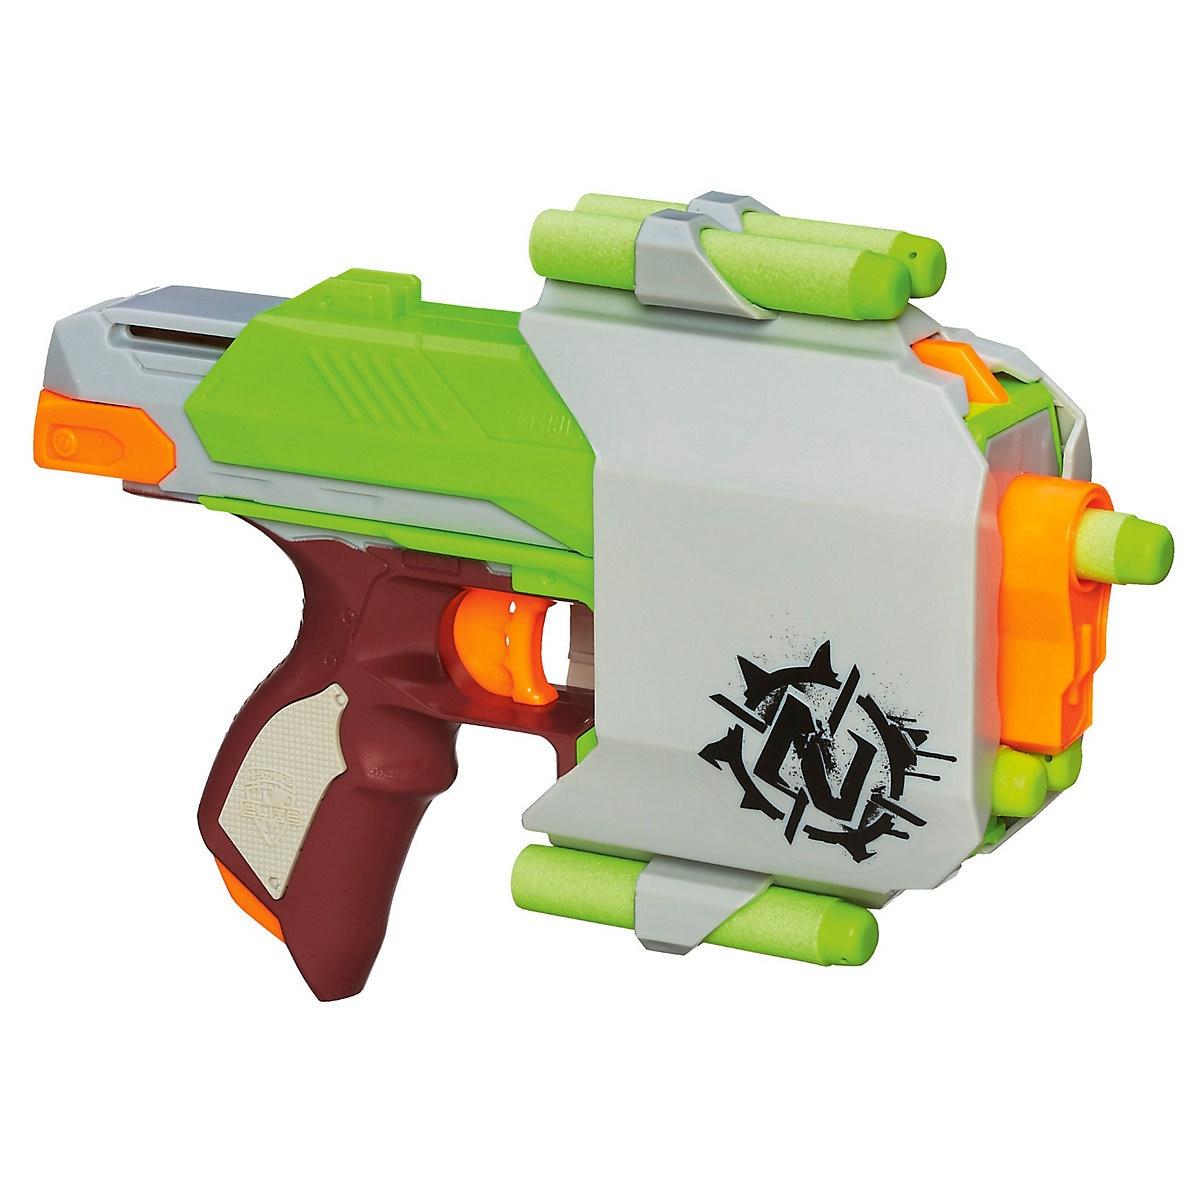 Nerf Toy Guns 3405527 Boys weapon sword blaster blasters toys for children game play boy MTpromo